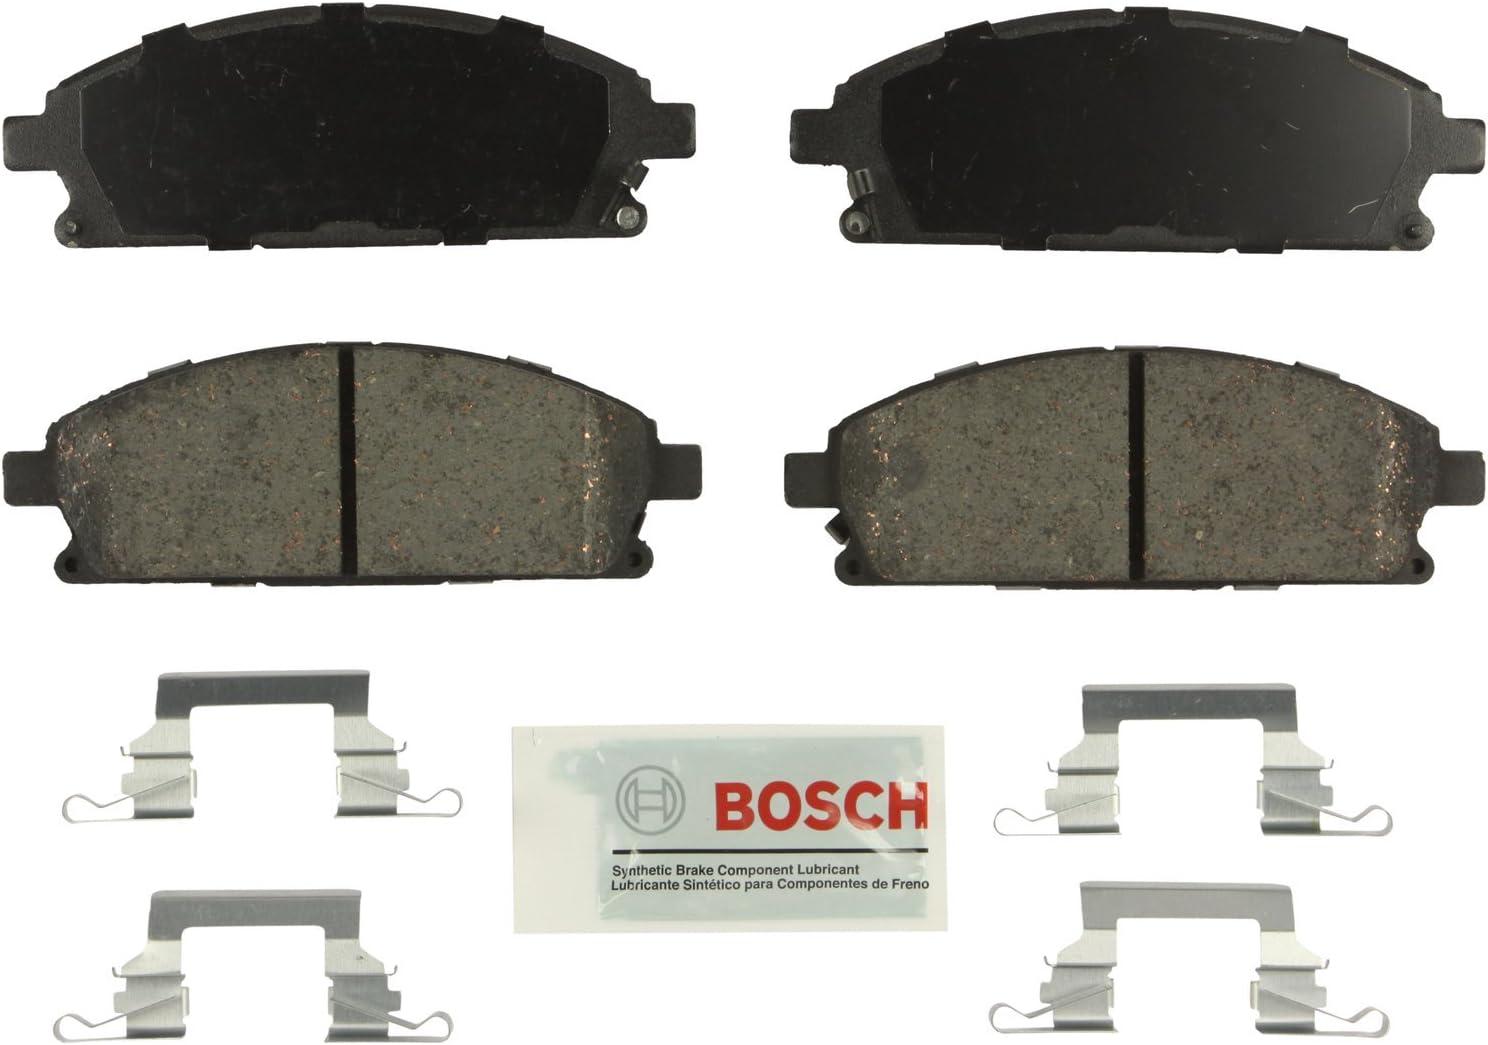 Front Ceramic Brake Pads wHardware for Acura MDX Q45 QX4 Nissan Pathfinder Quest